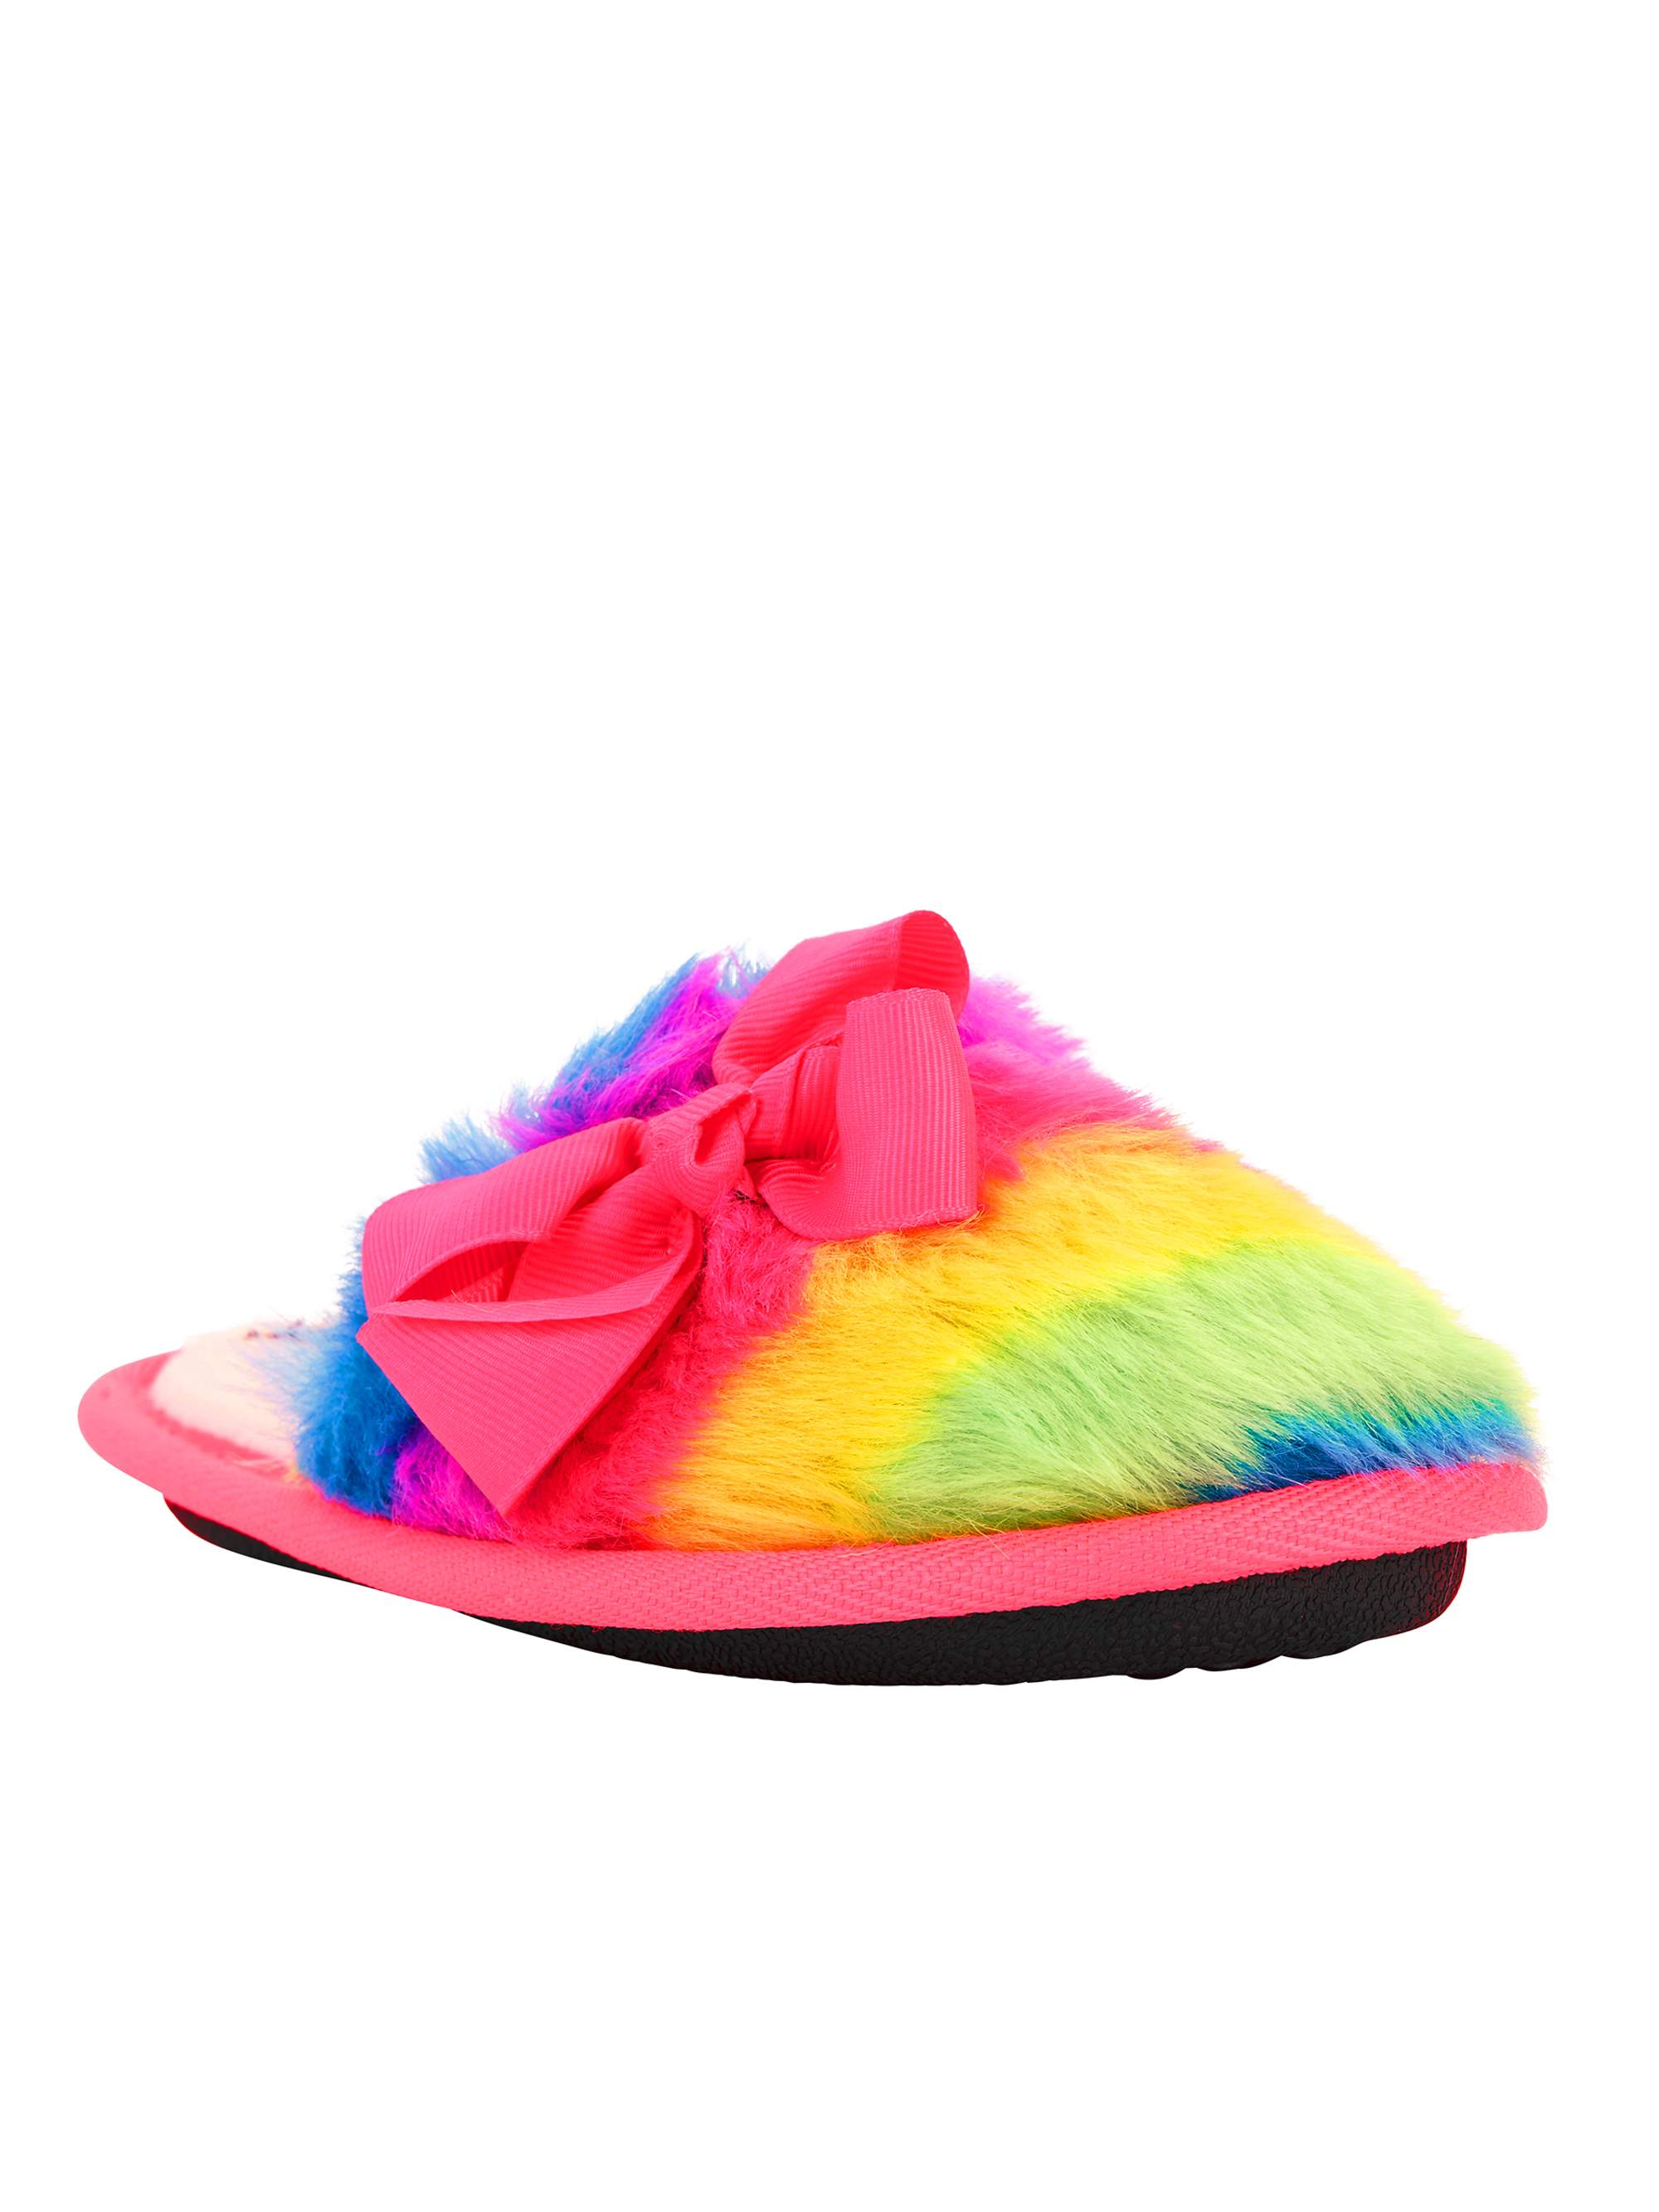 Jojo Siwa Rainbow Fluffy Scuff Slippers